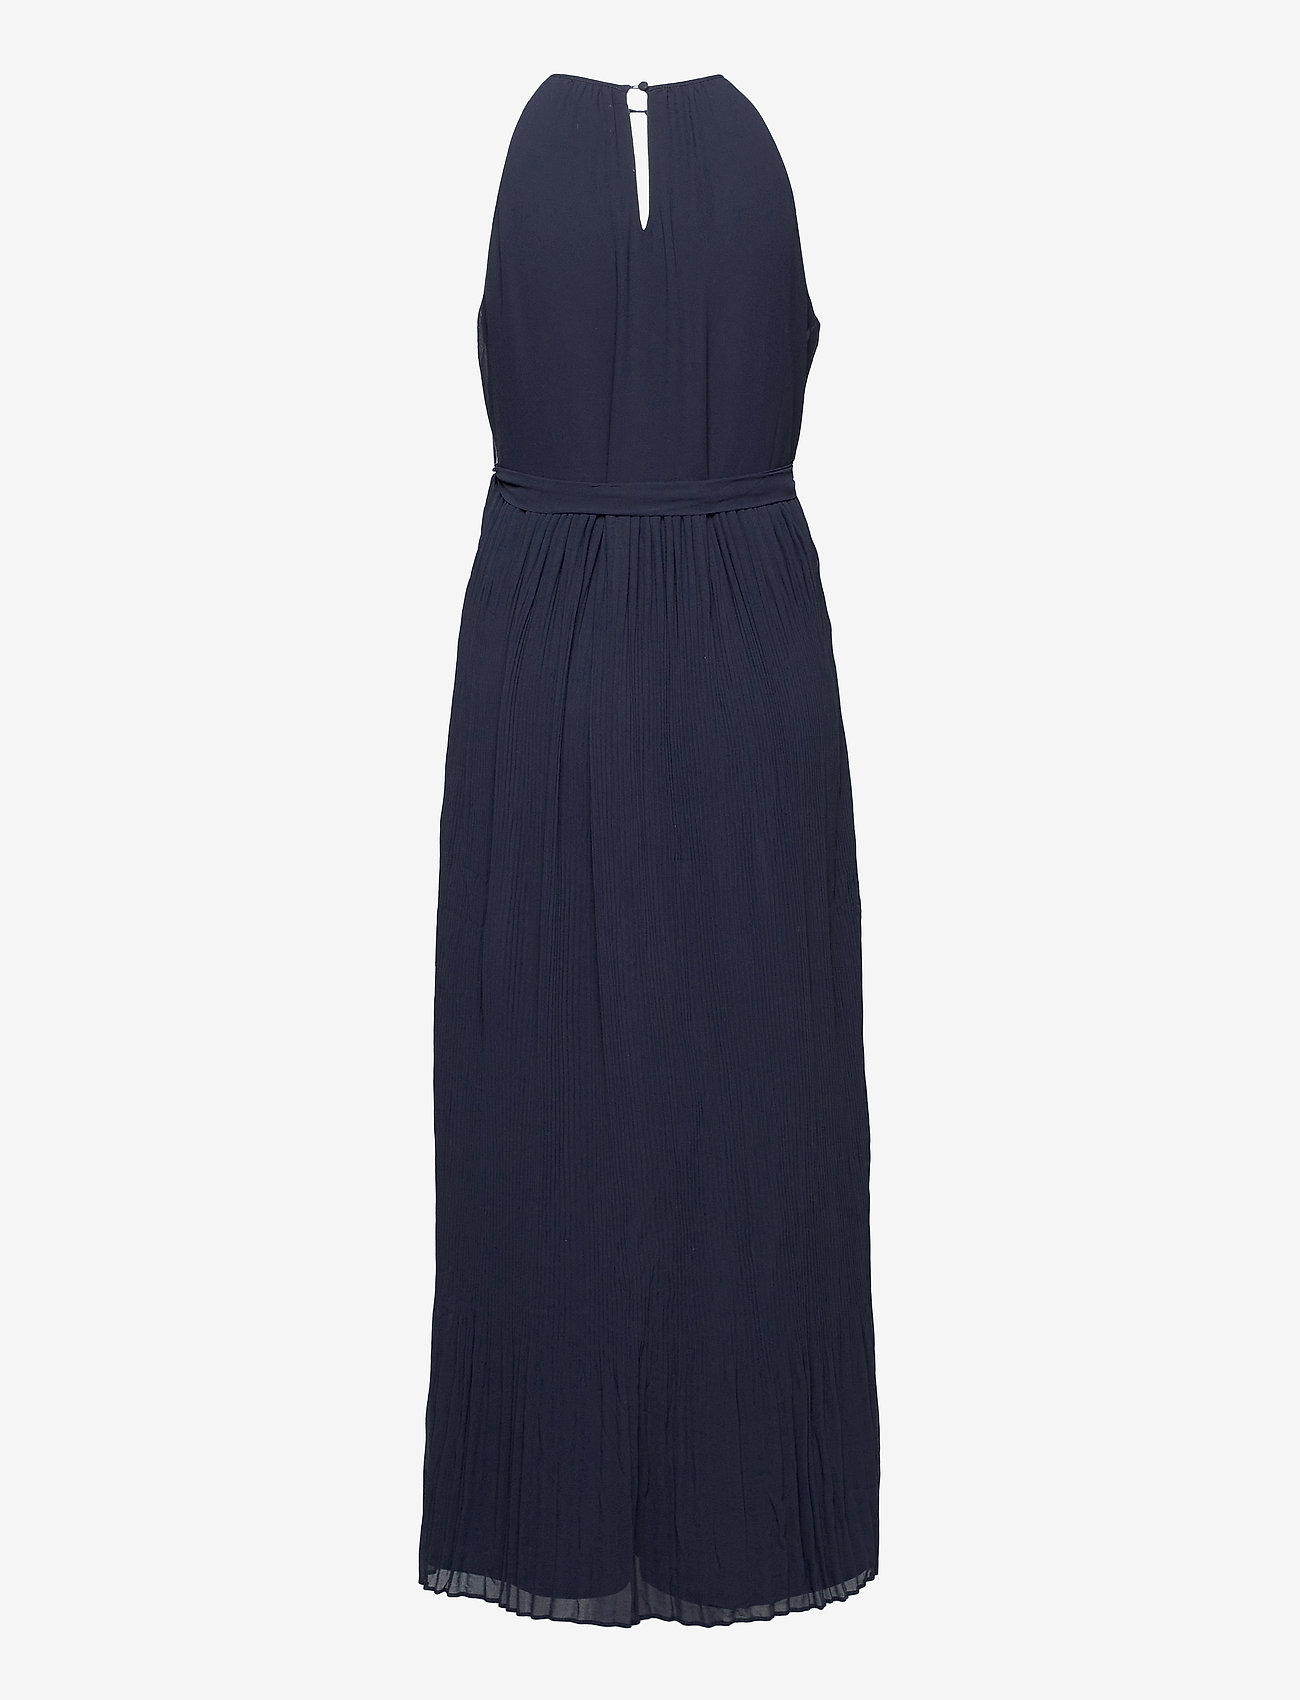 Vila - VIKATELYN HALTERNECK DRESS/DC/SU - sommerkjoler - navy blazer - 1